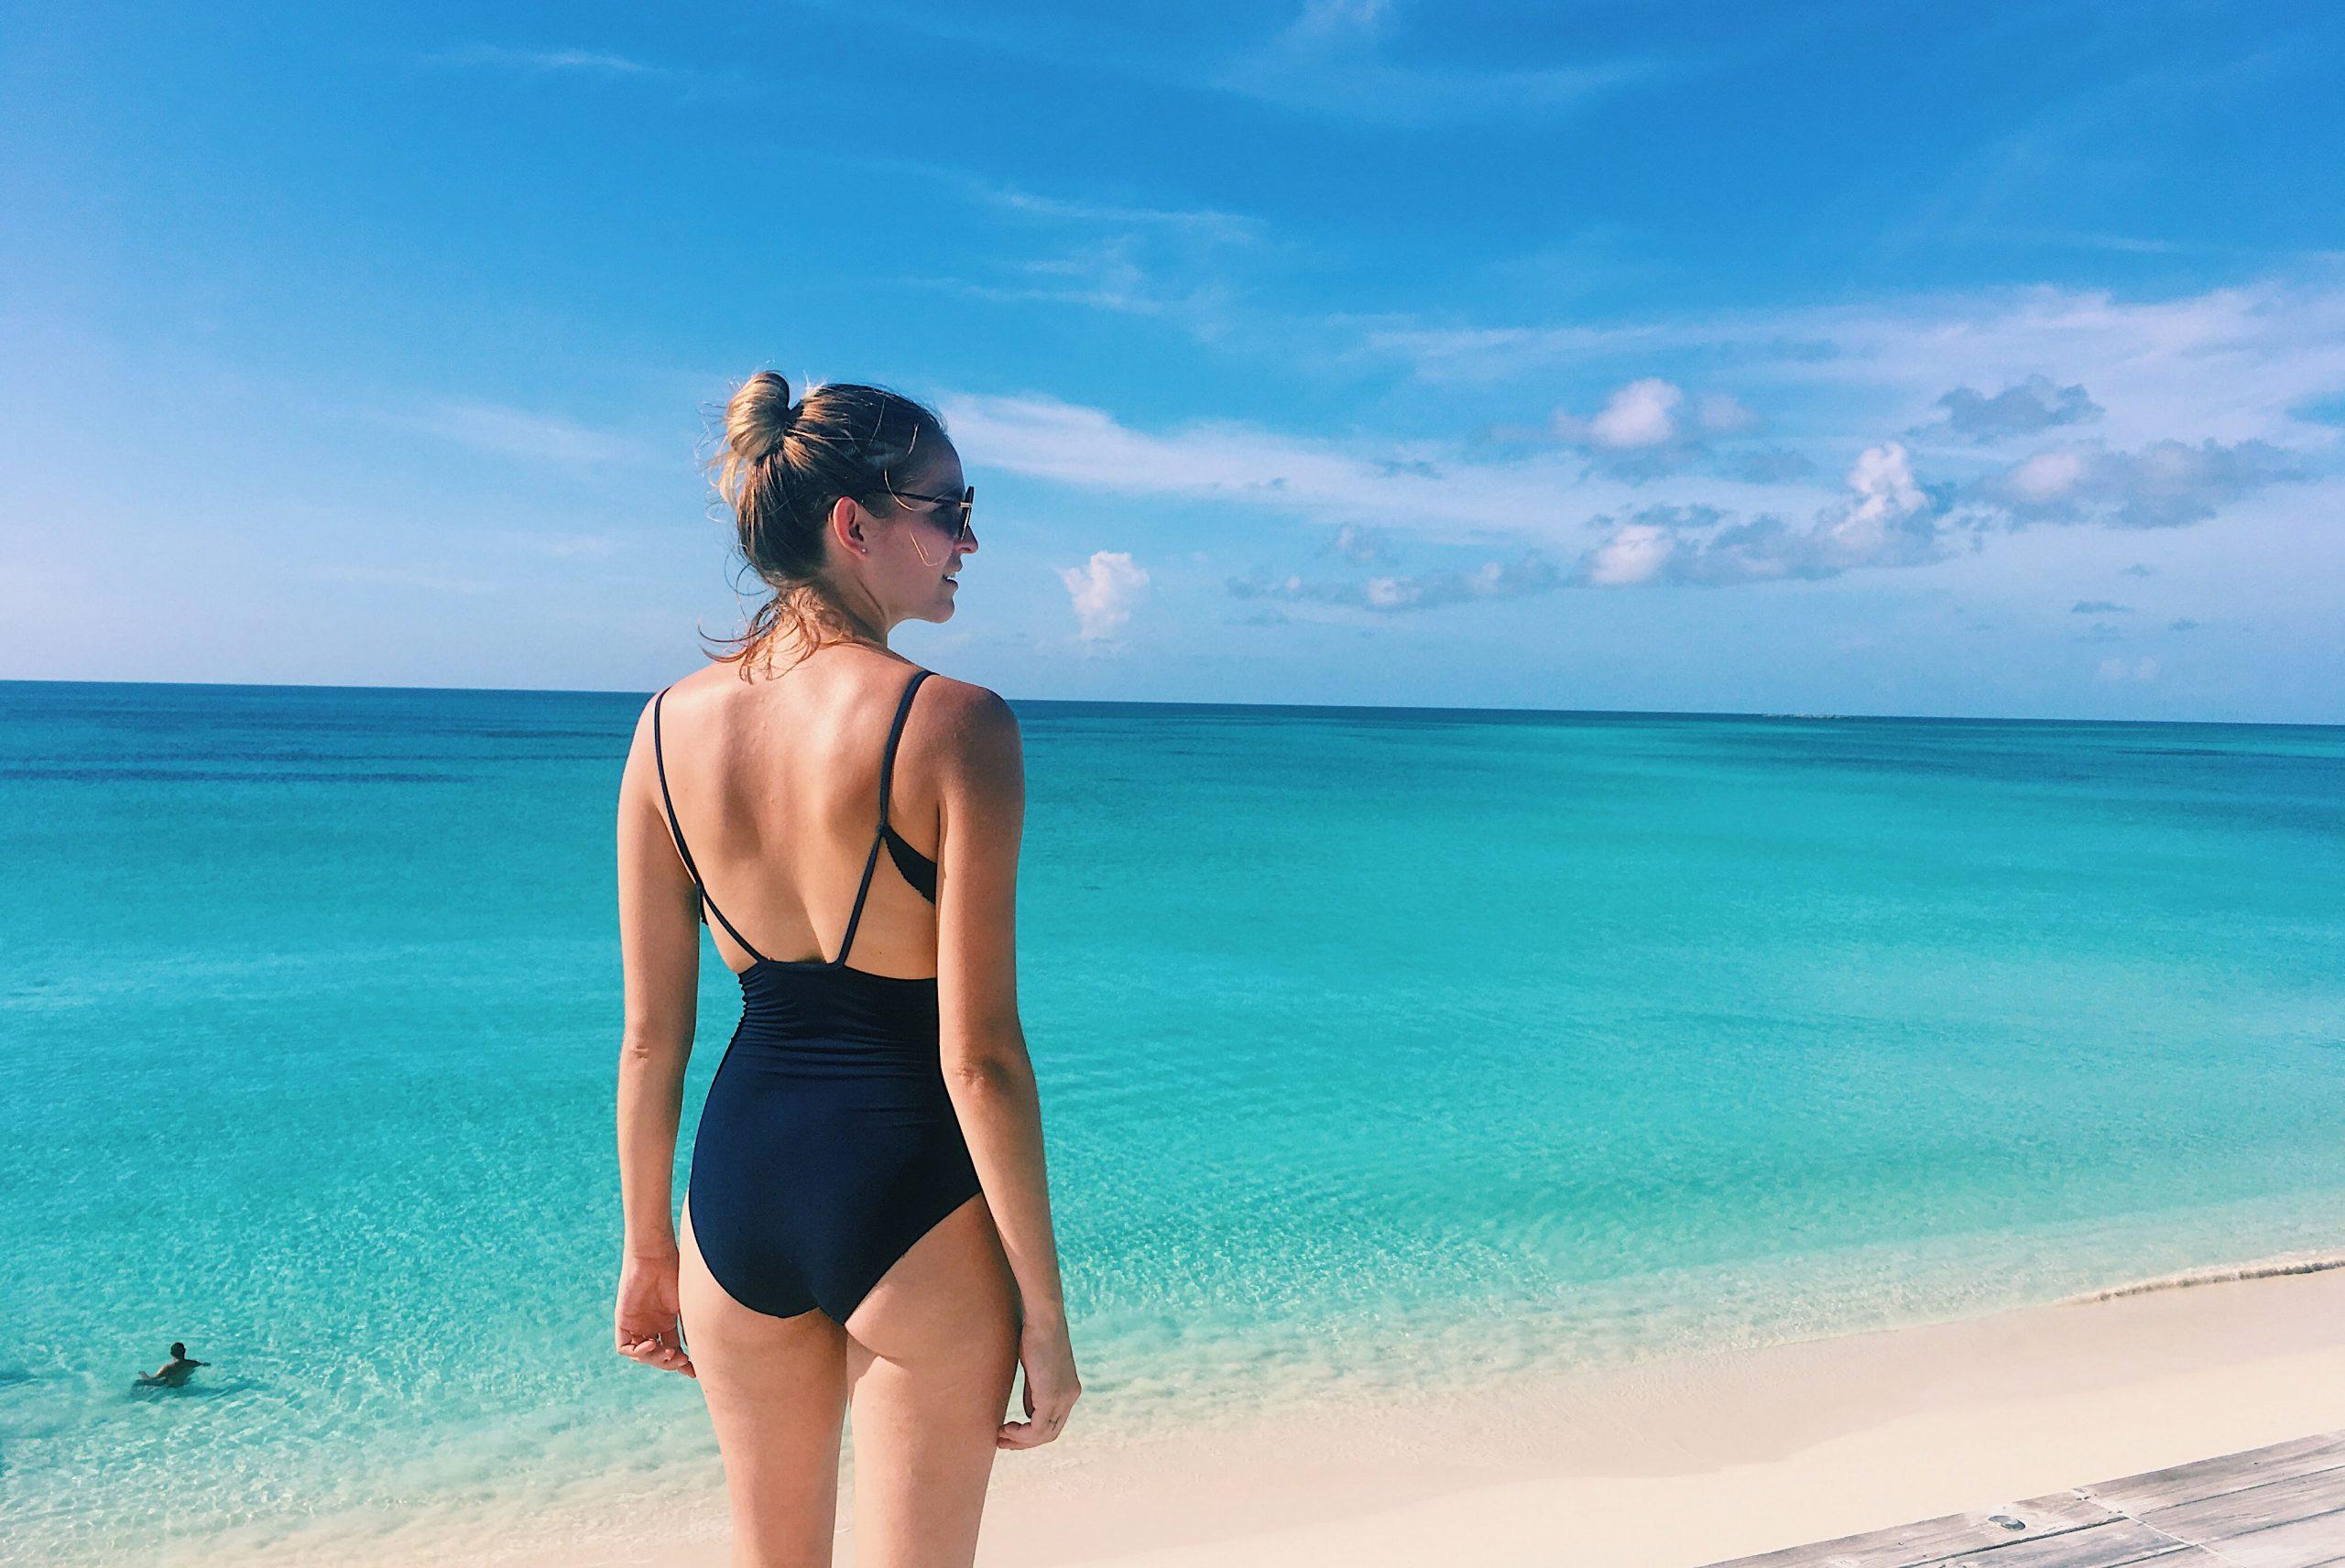 Elisa sur Bahamas Ile Rose